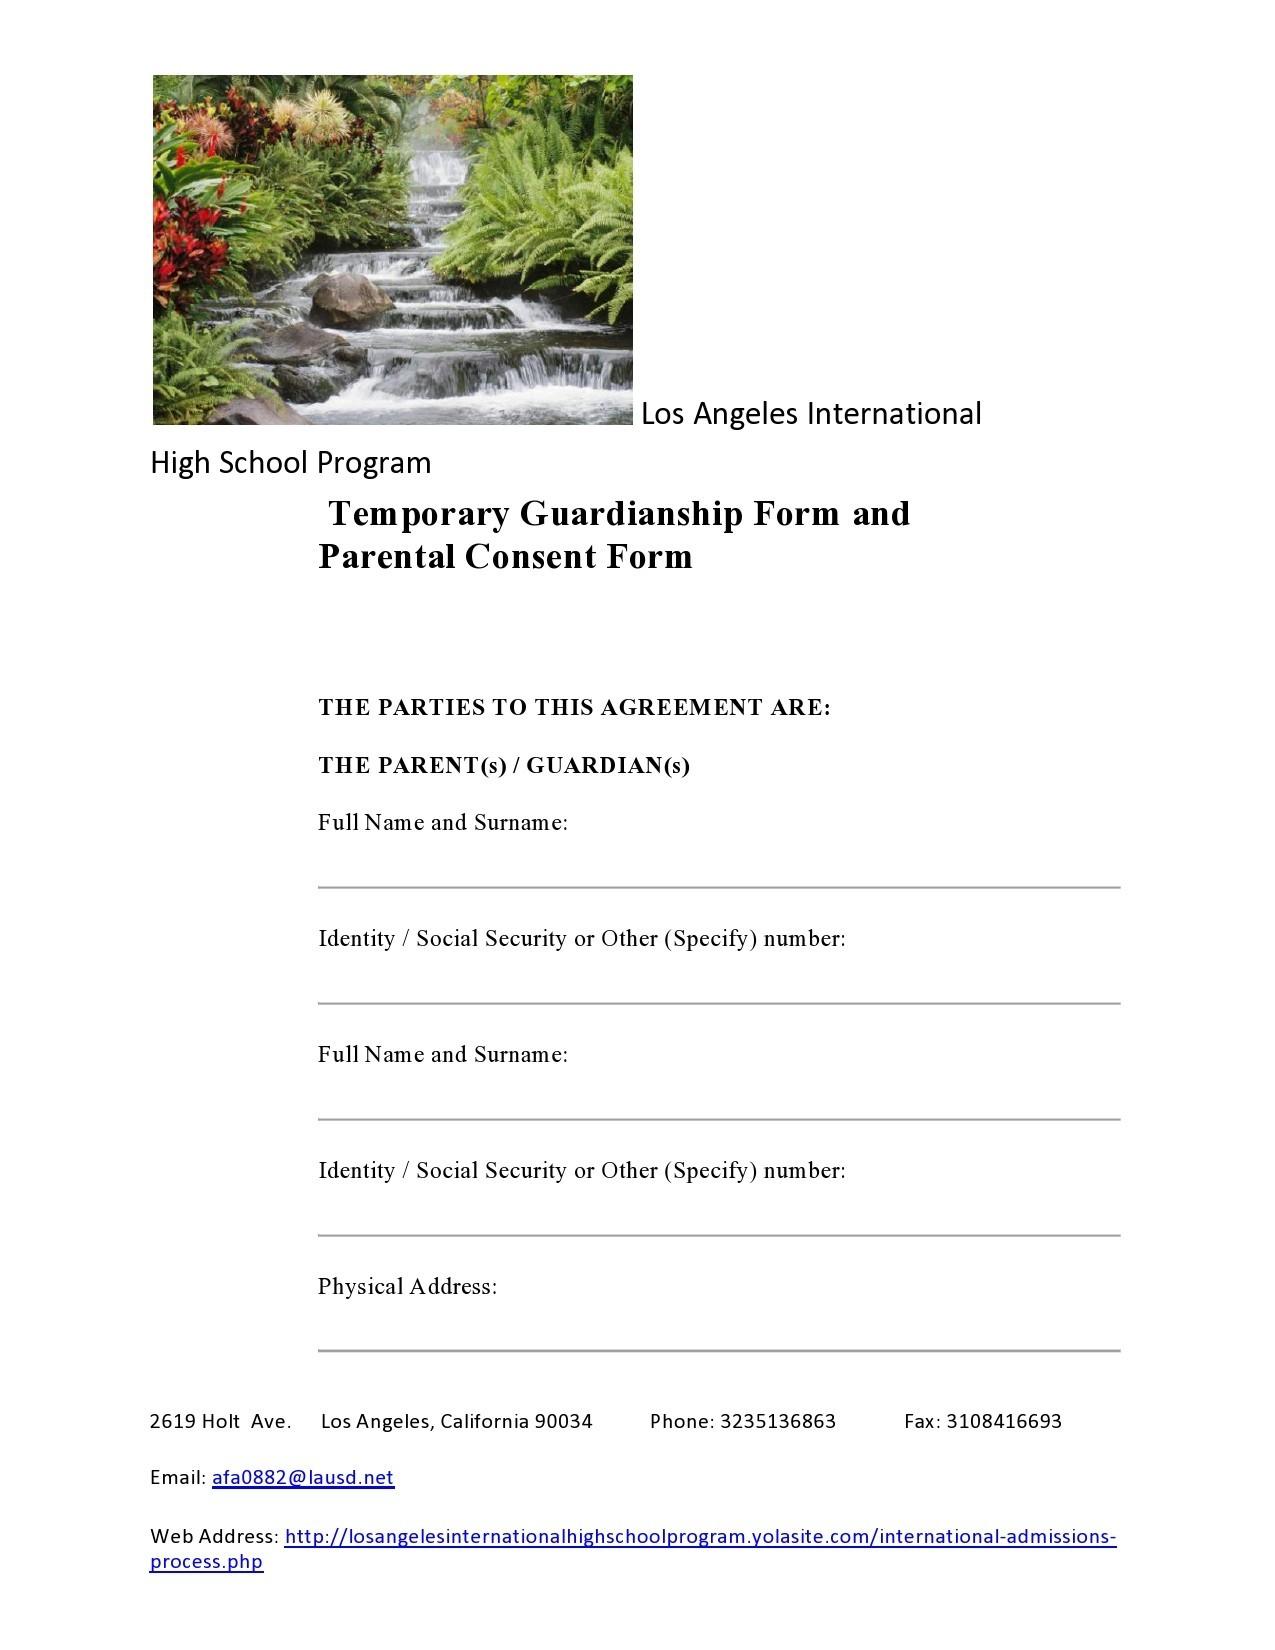 Free guardianship form 18